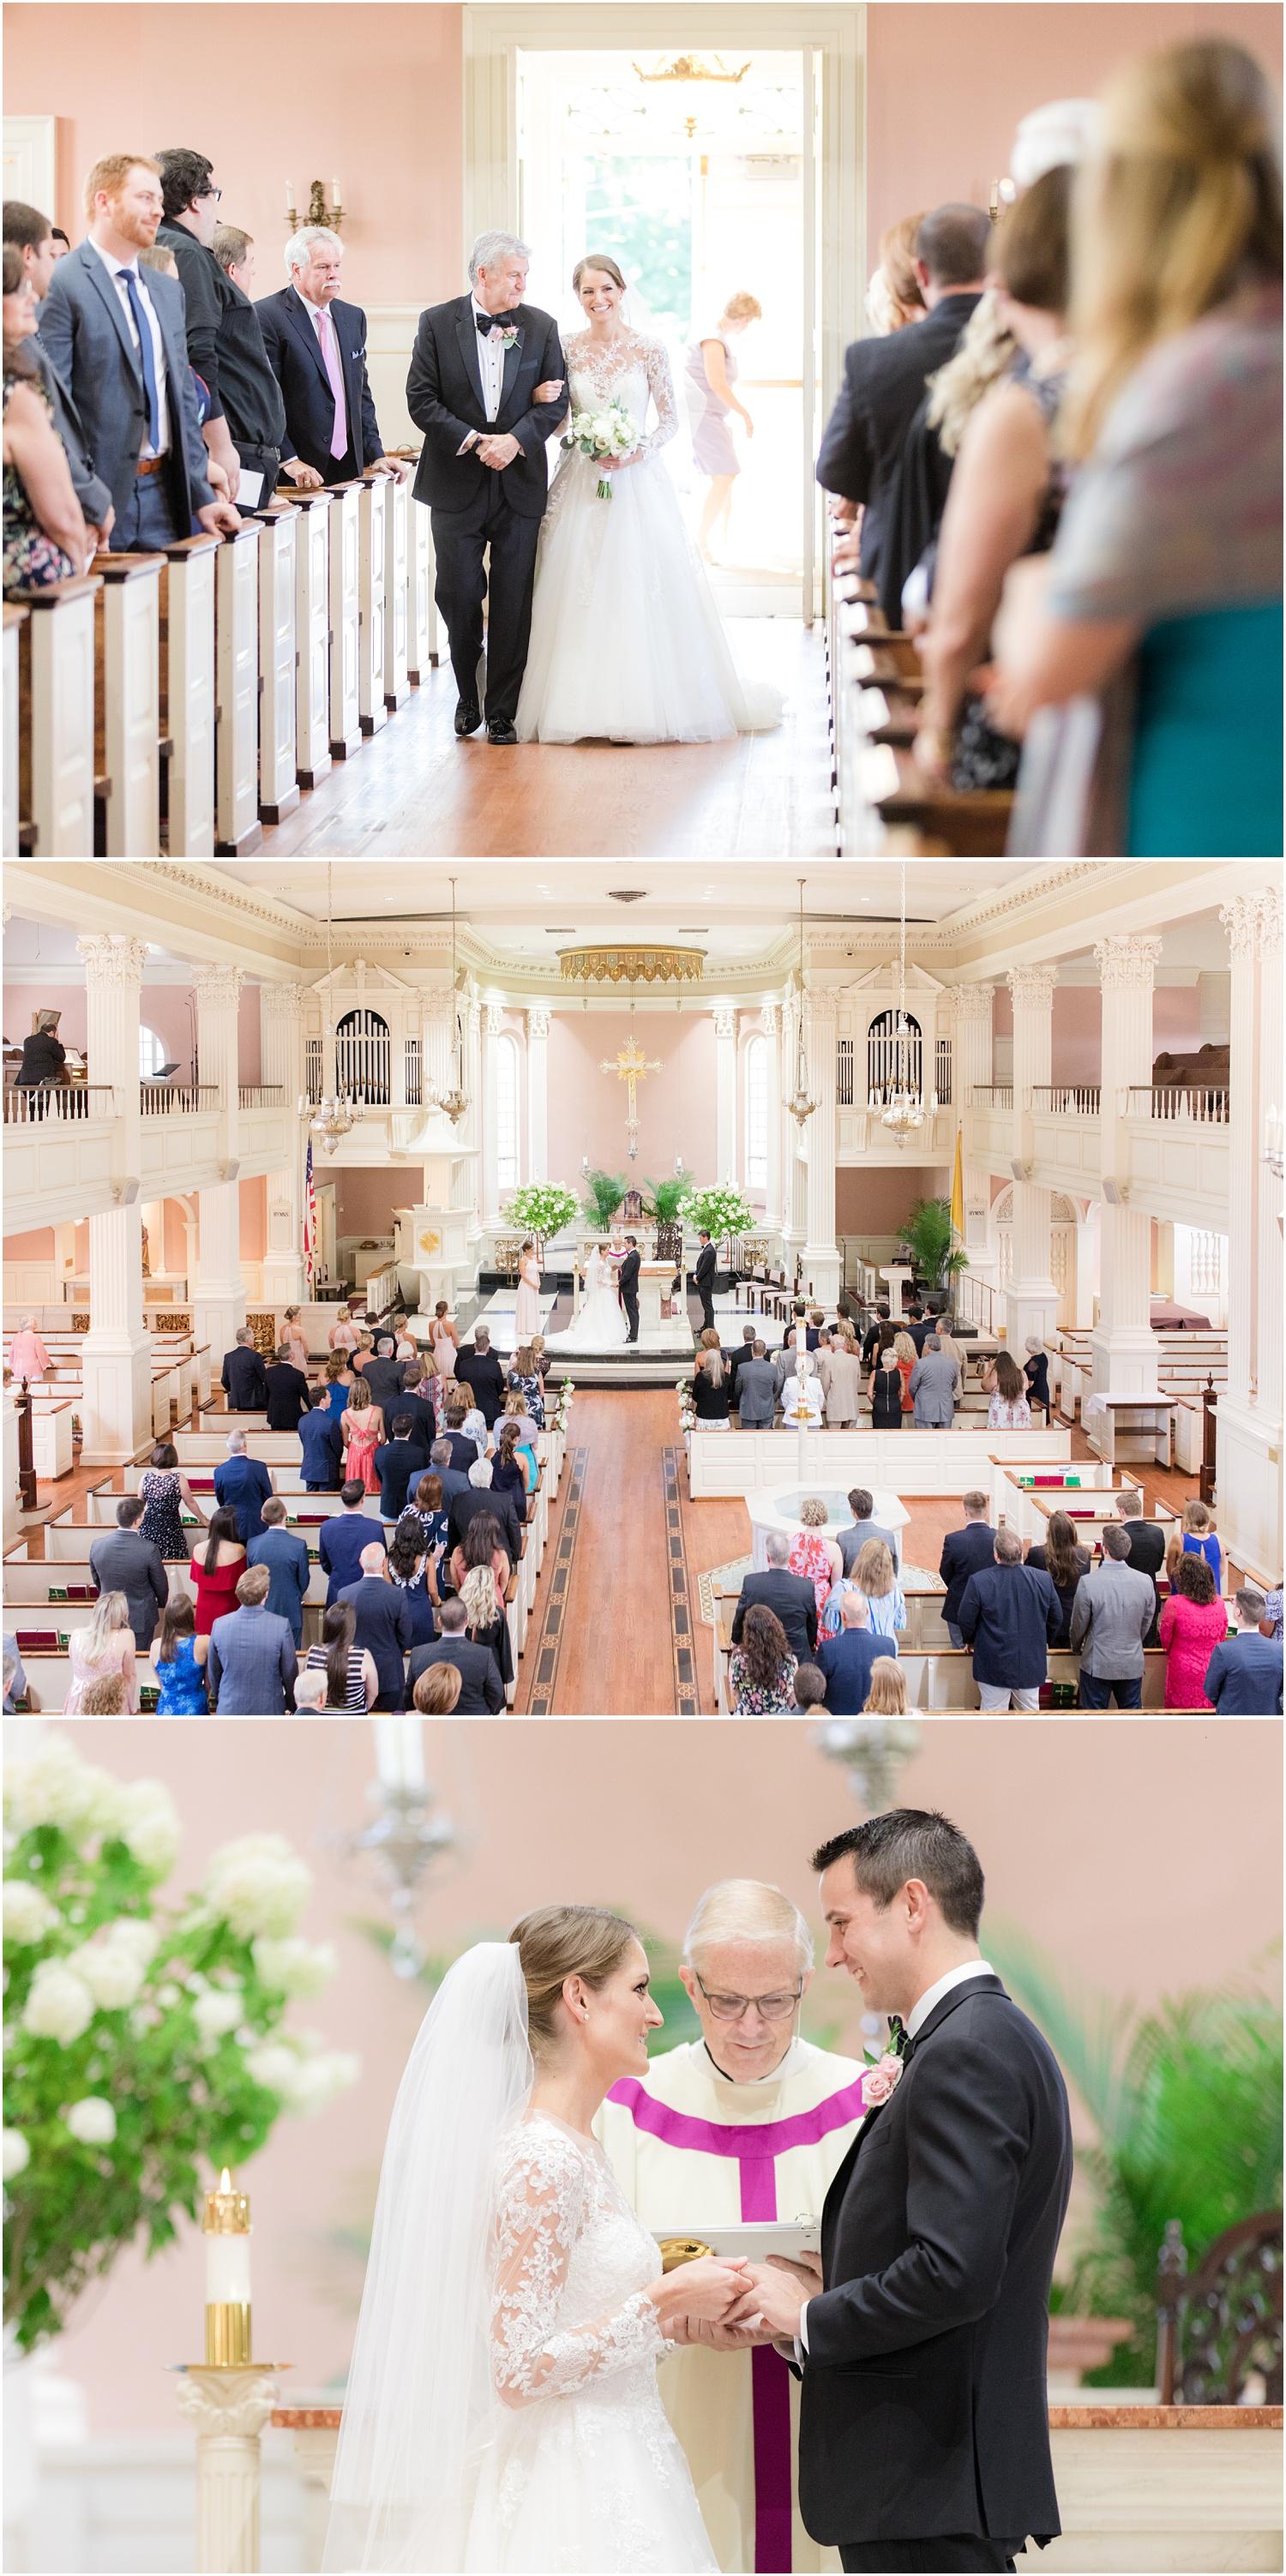 Wedding ceremony at St. Rose of Lima in Short Hills, NJ.